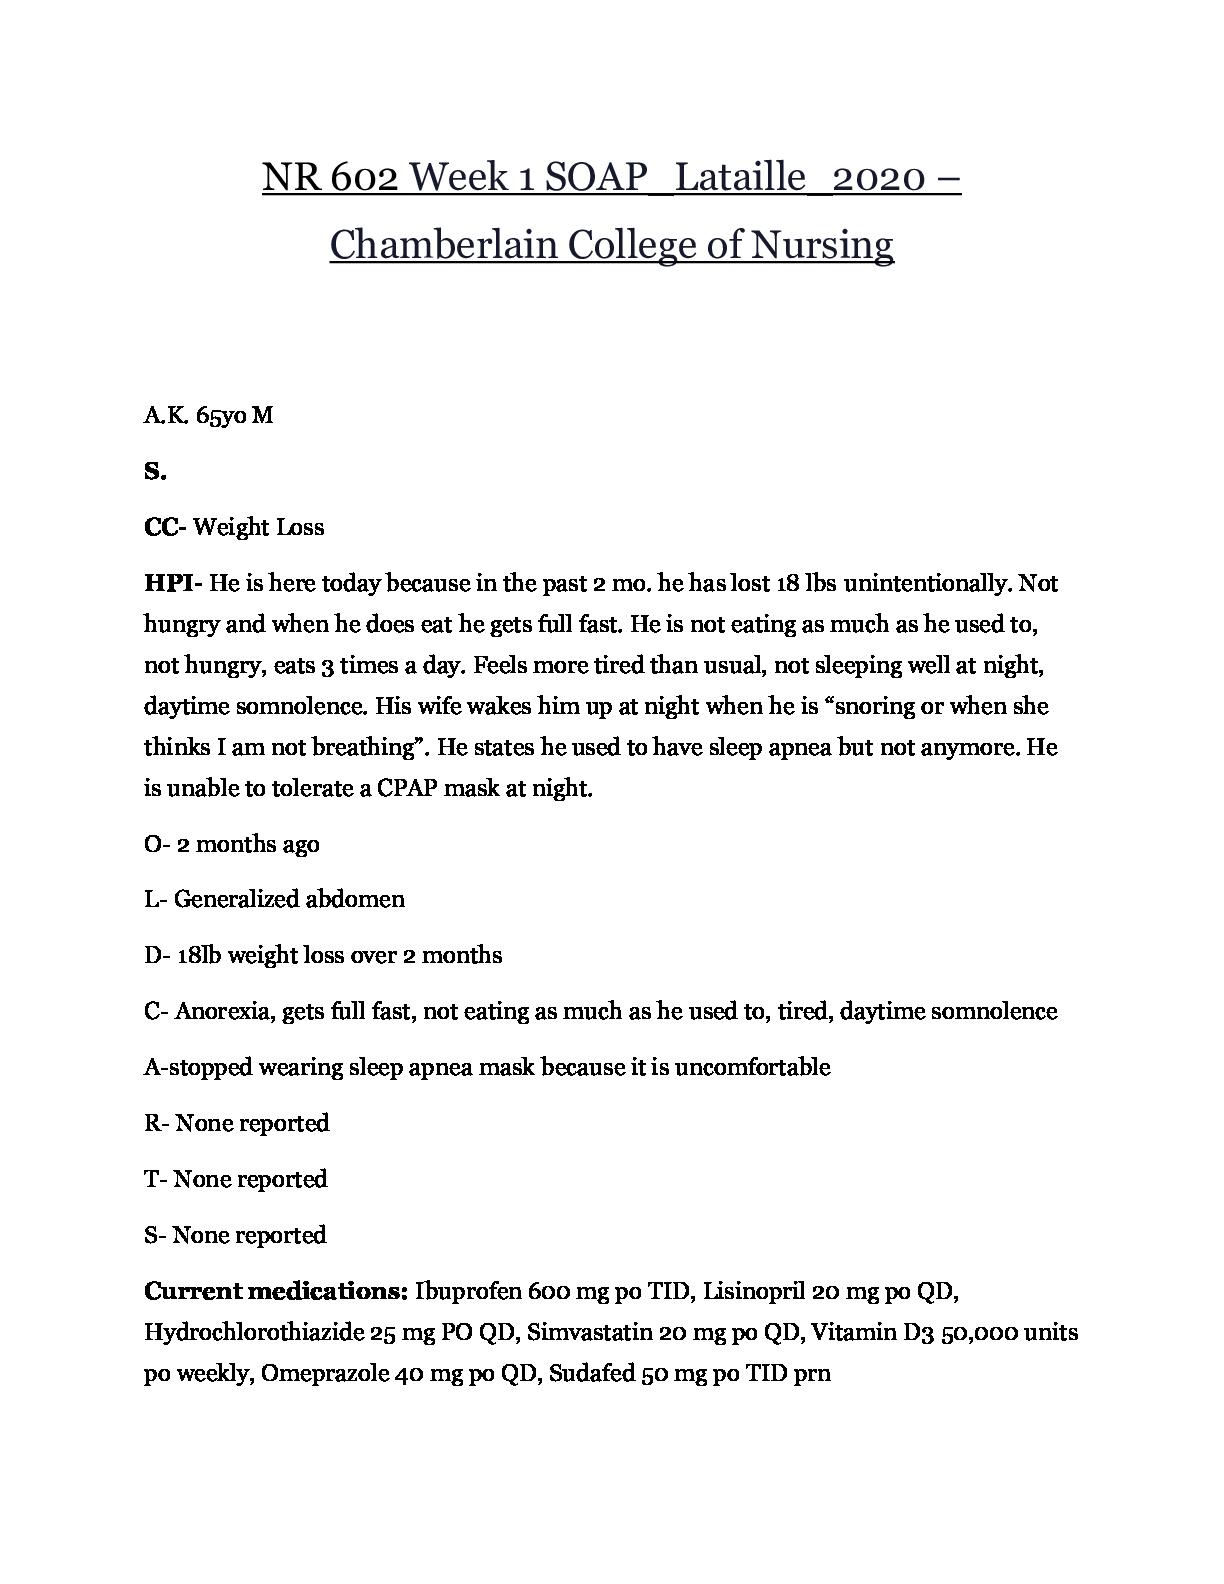 Soal ujian nasional sma/ma 2015. Soal Essay Discussion Text